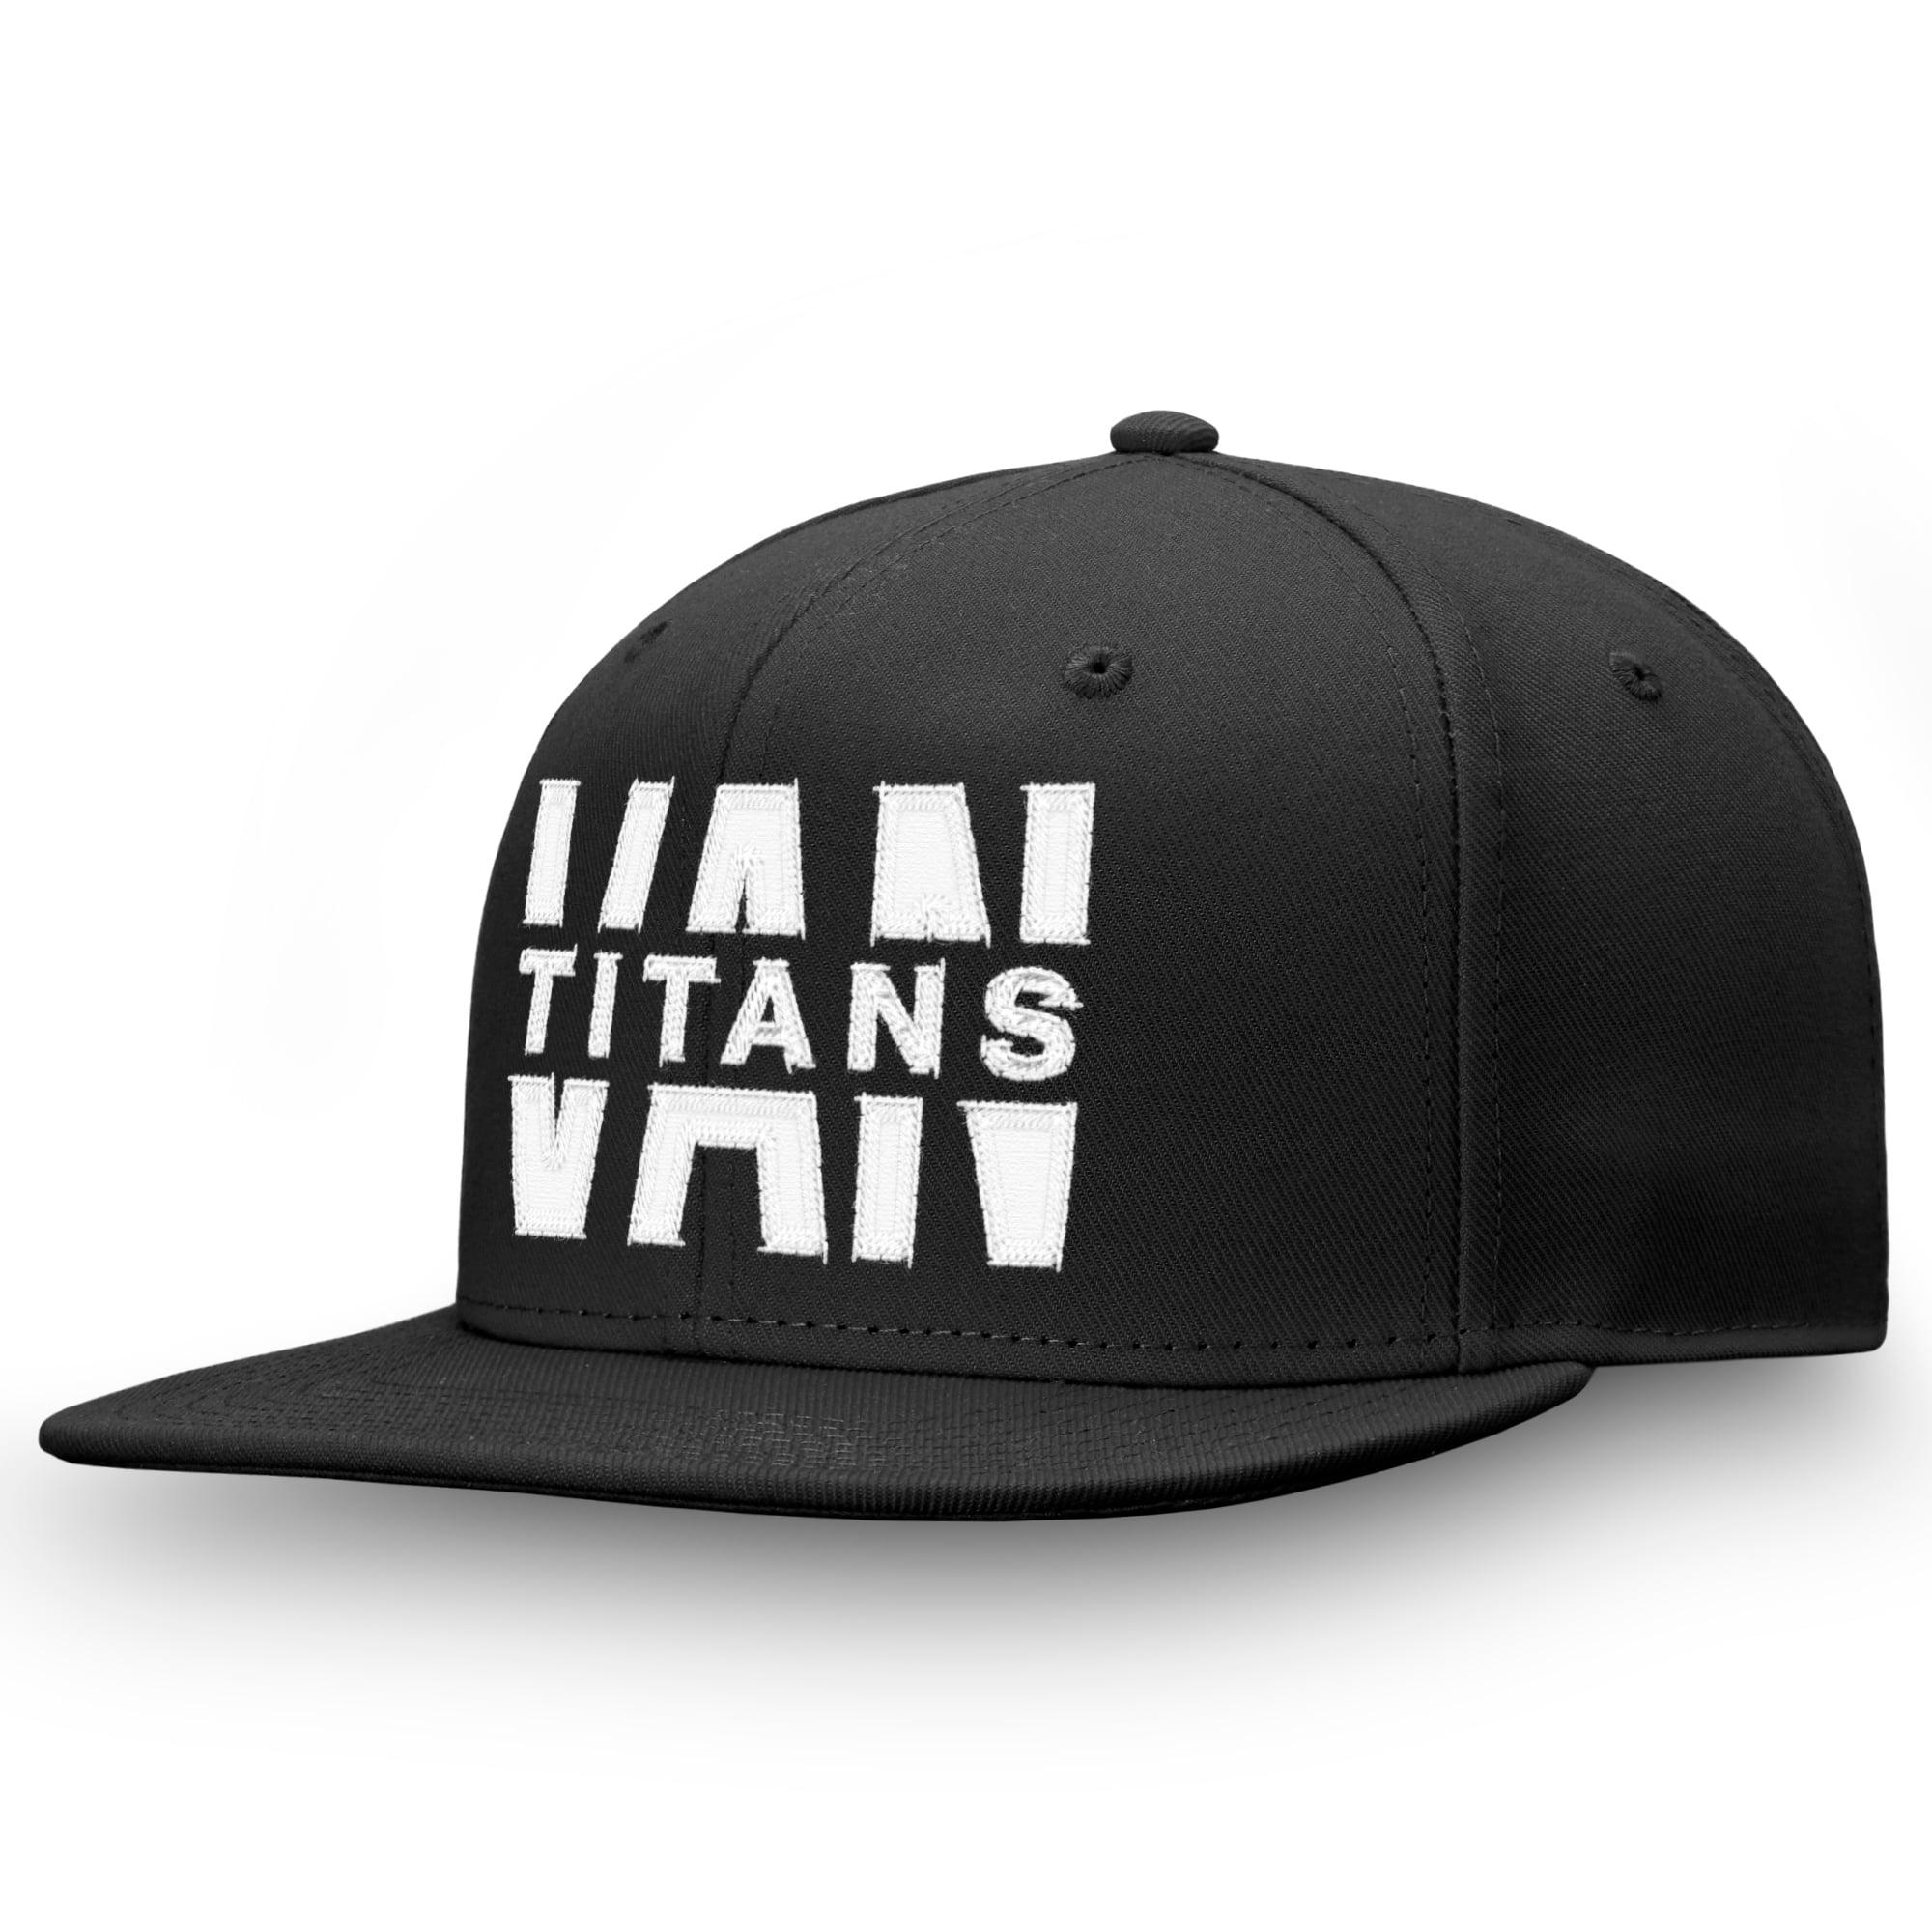 Vancouver Titans Fanatics Branded Profile Adjustable Snapback Hat - Black - OSFA